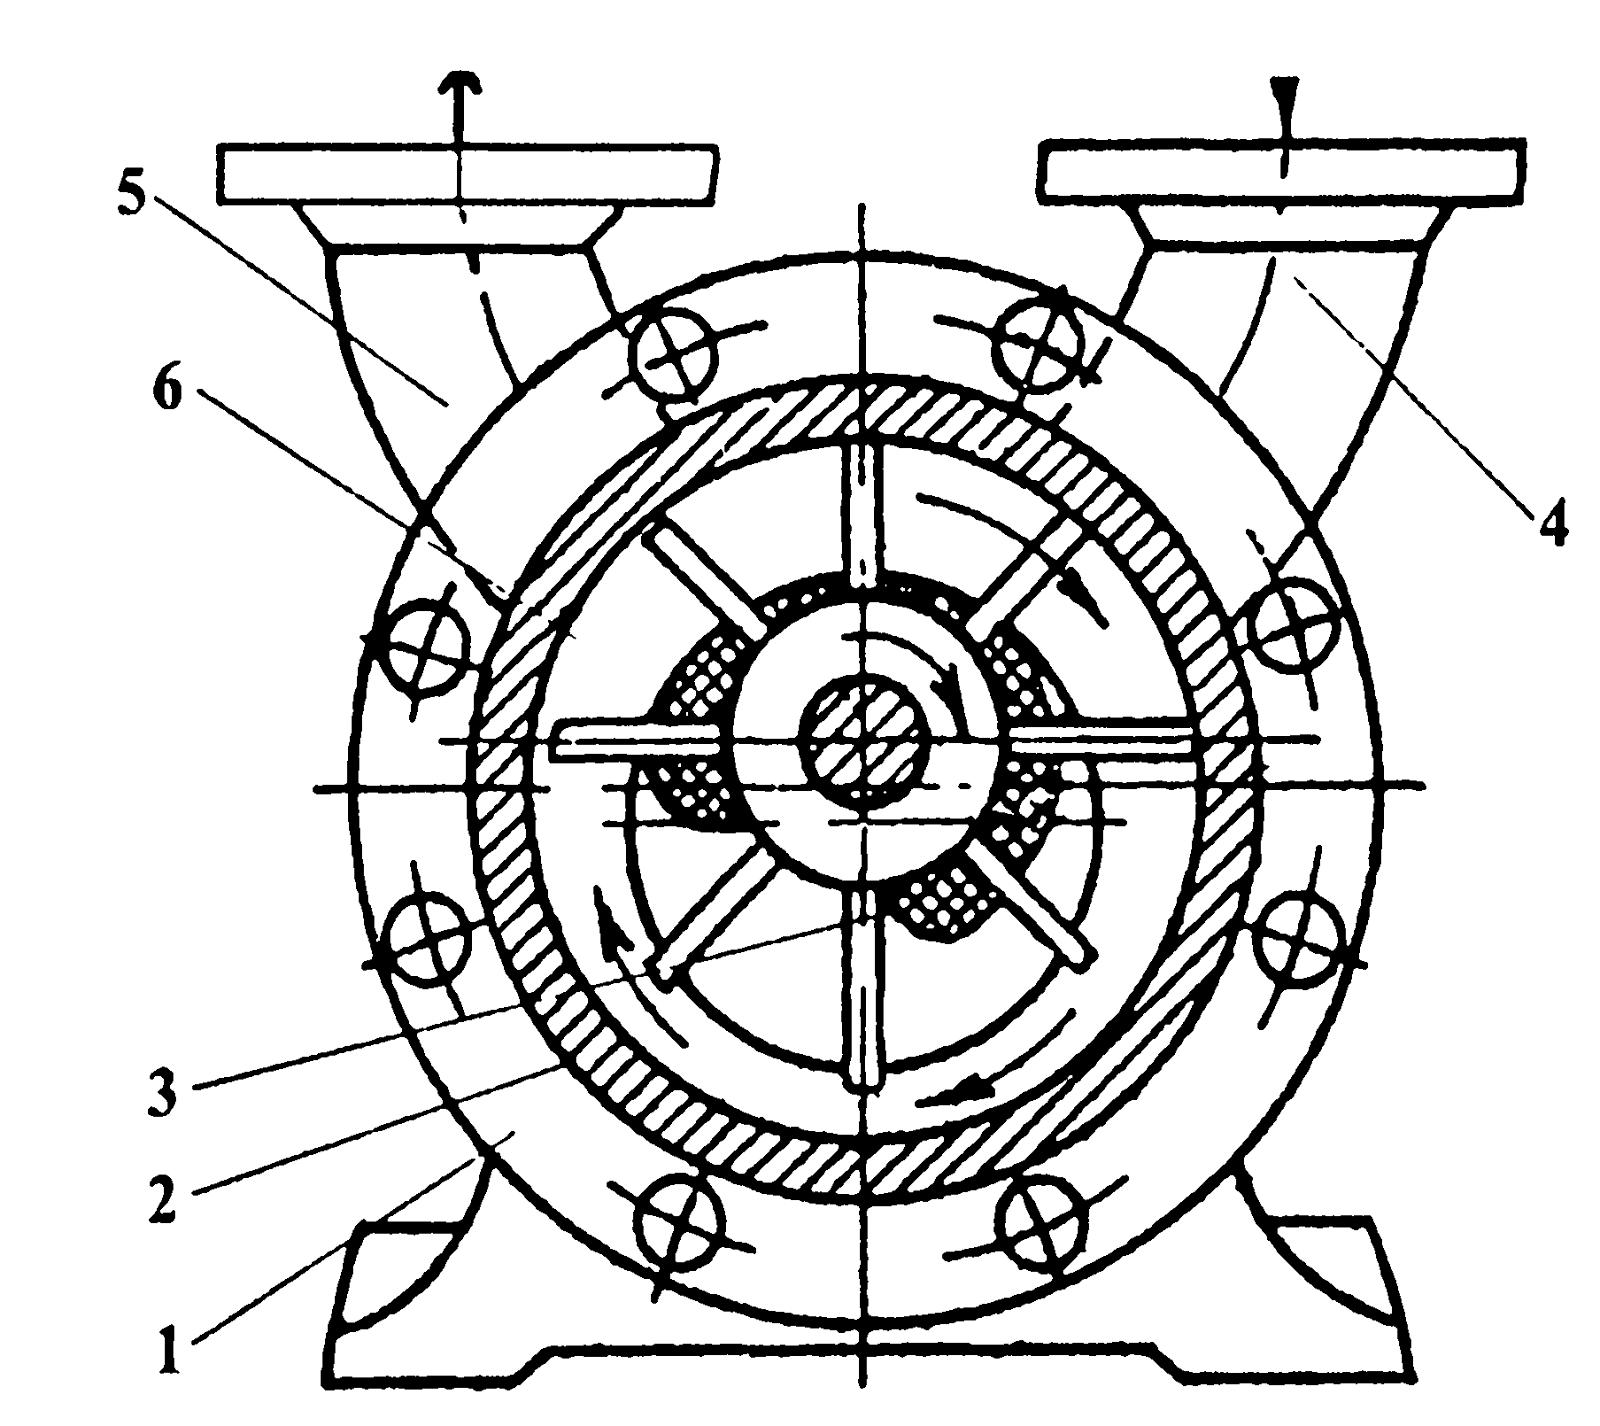 пуско-защитное устройство центробежного насоса схема